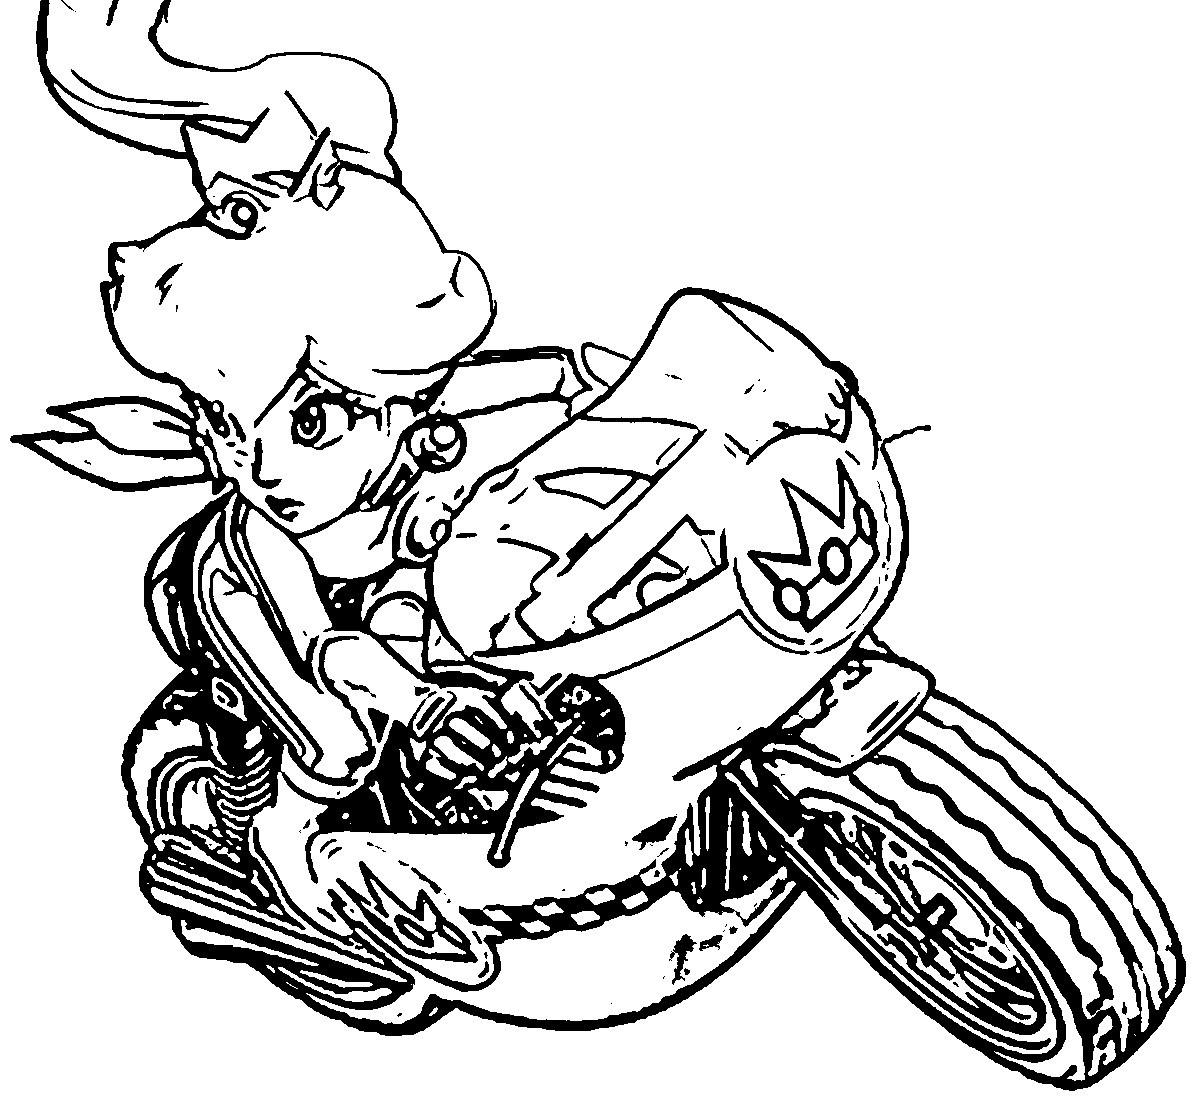 Mario Kart 8 Drawings | Free download on ClipArtMag